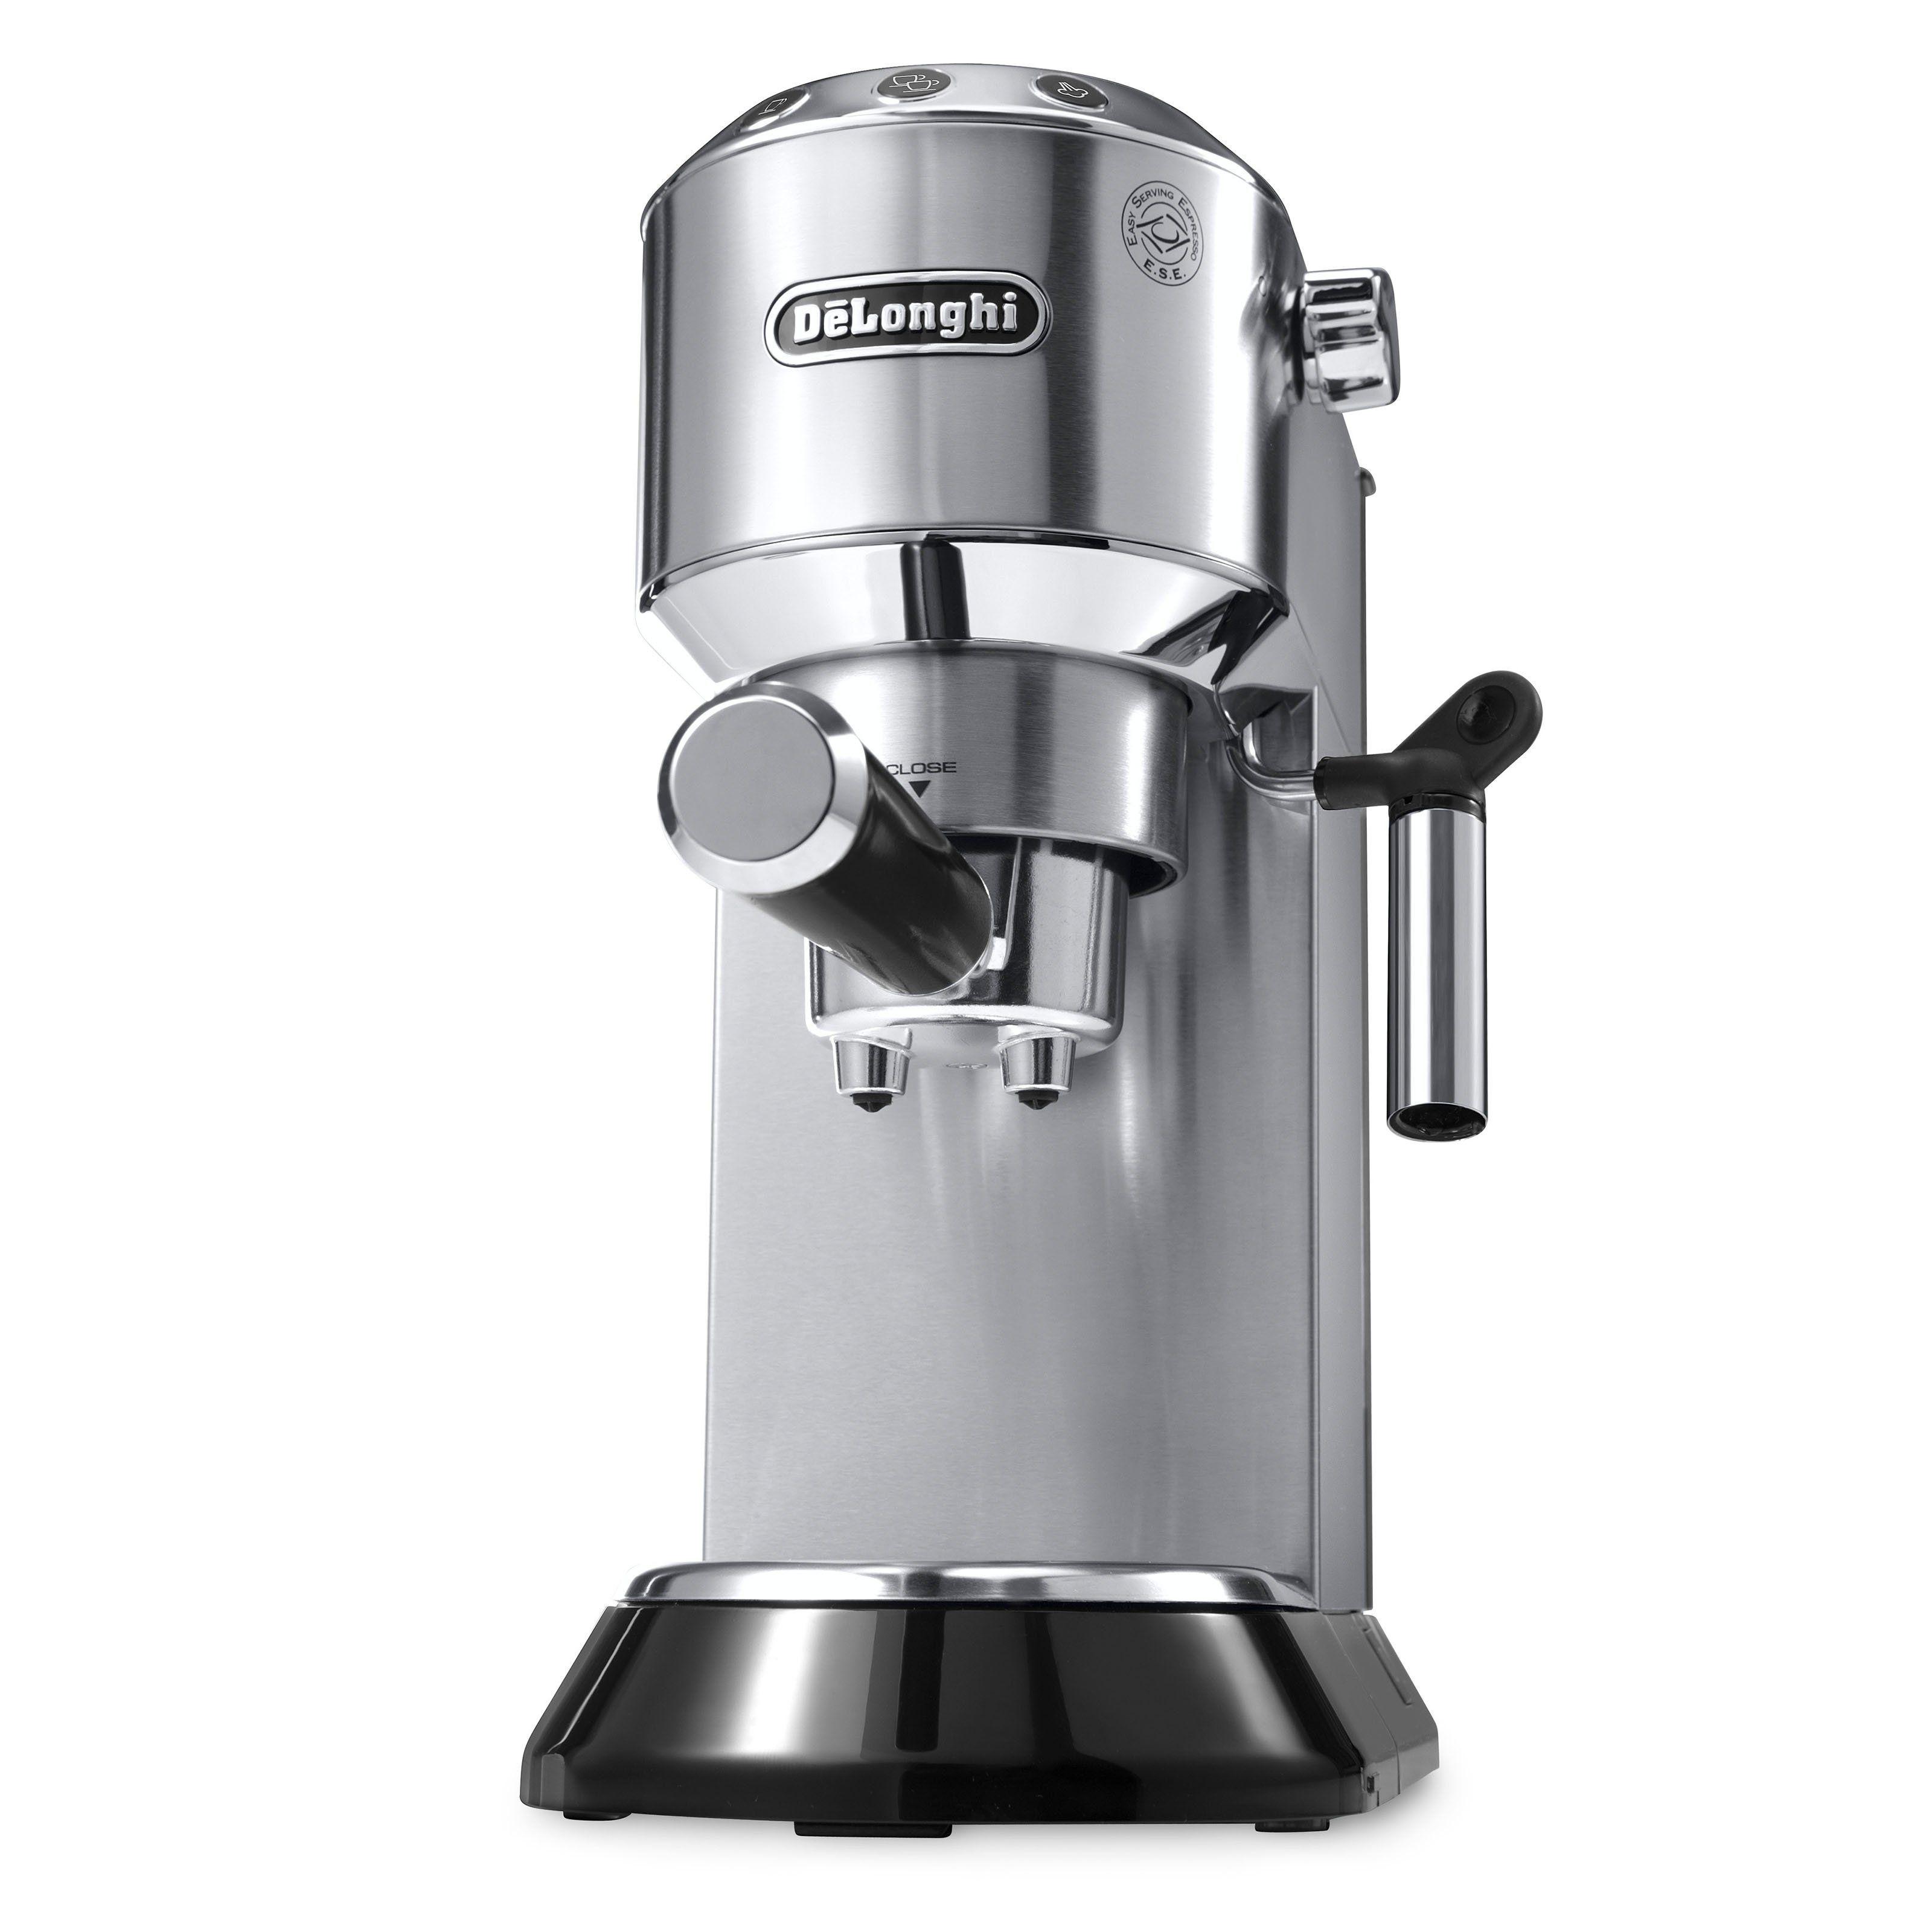 Delonghi Dedica Ec680b Espresso Maker With Images Automatic Espresso Machine Home Espresso Machine Cappuccino Machine